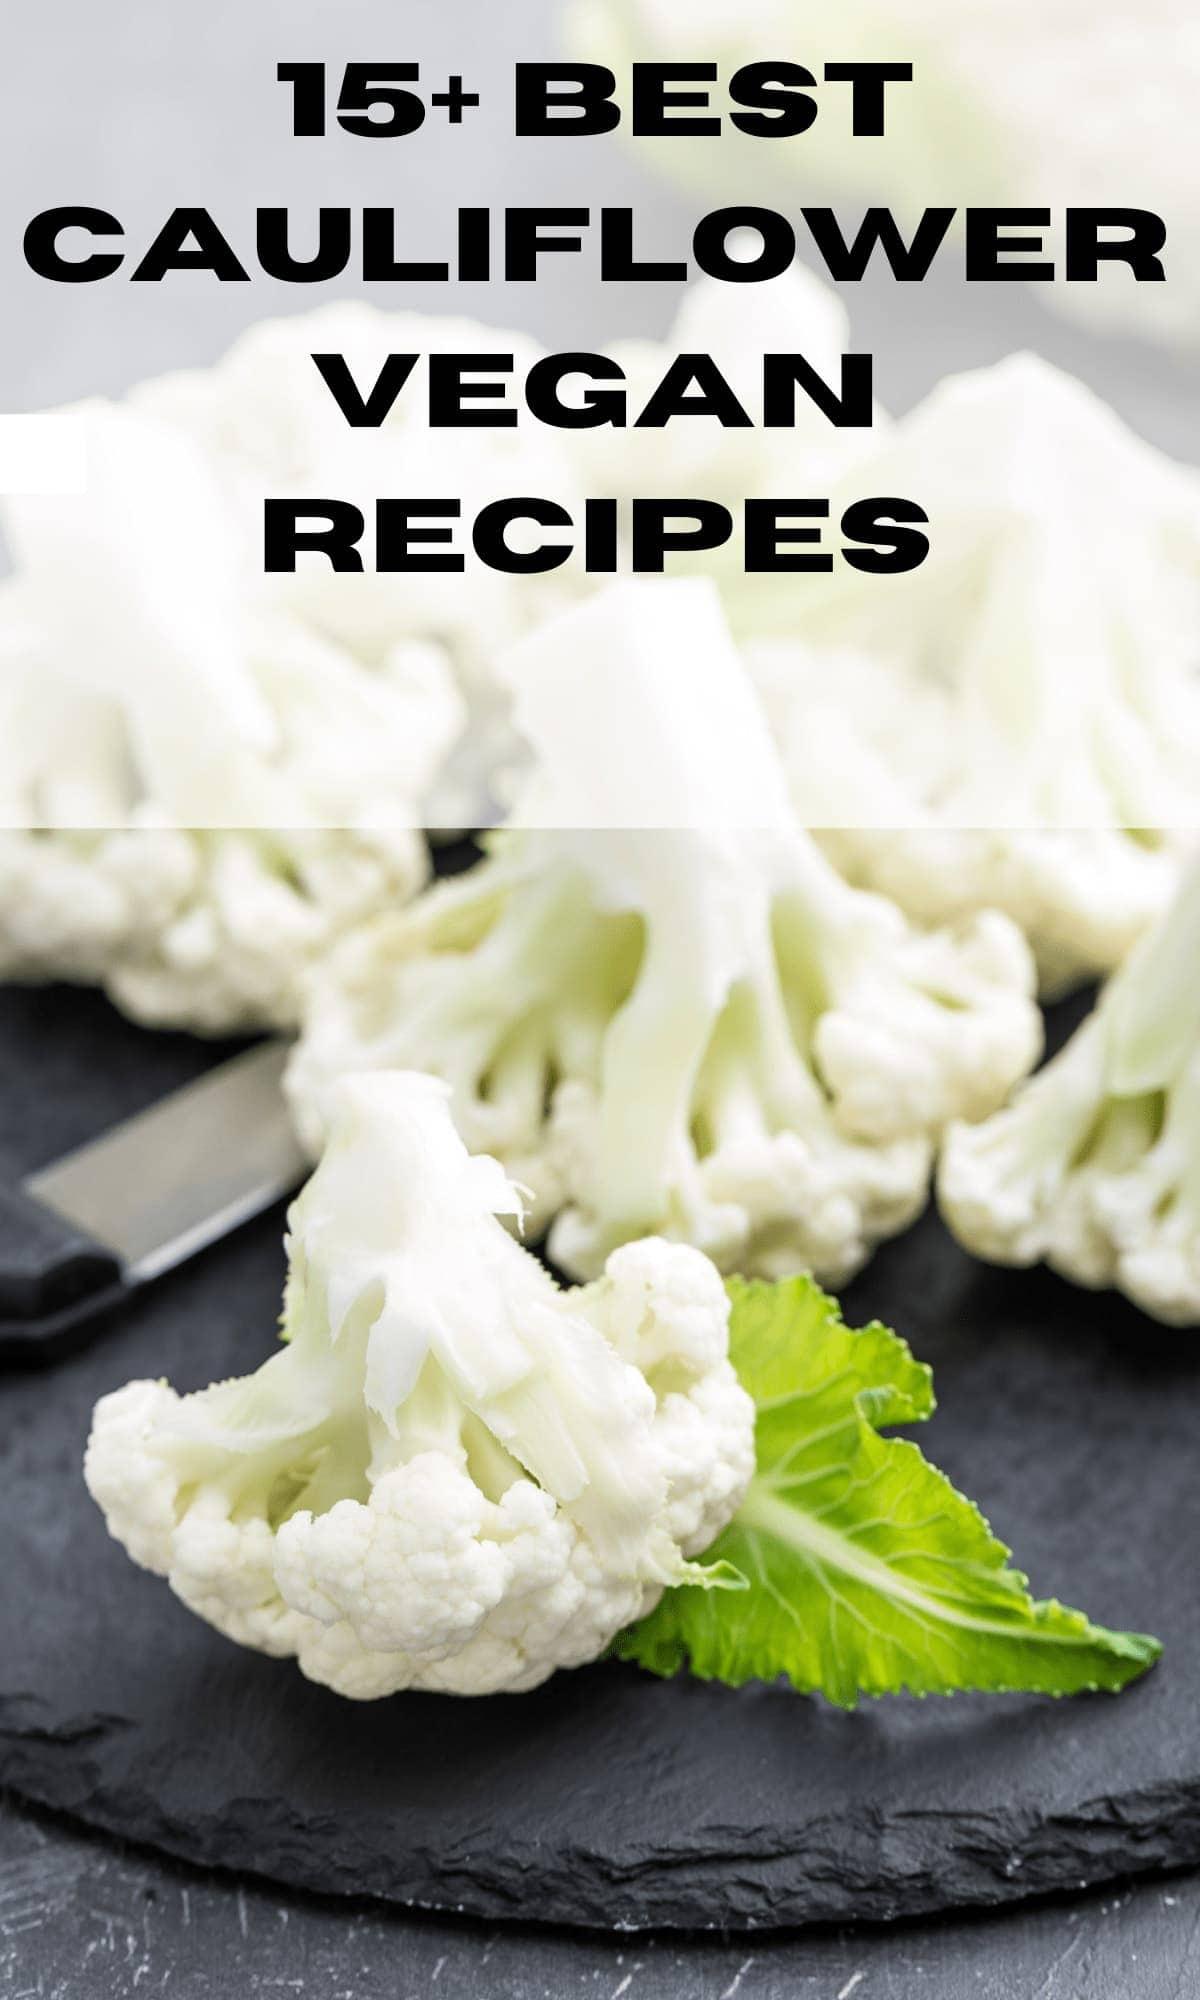 15+ Best Cauliflower Vegan Recipes